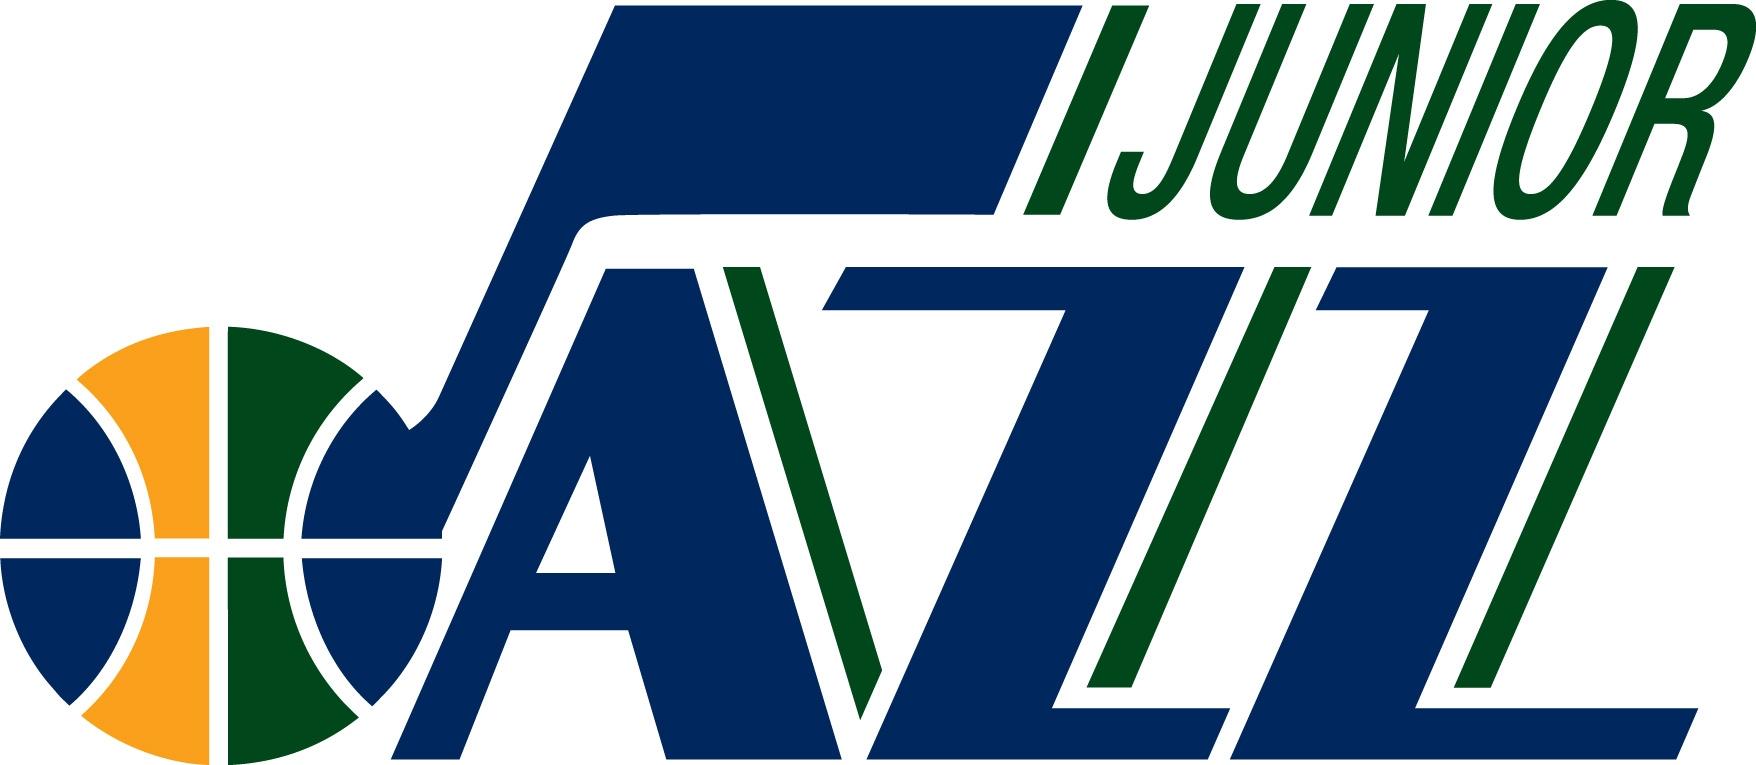 Jr. Jazz Basketball